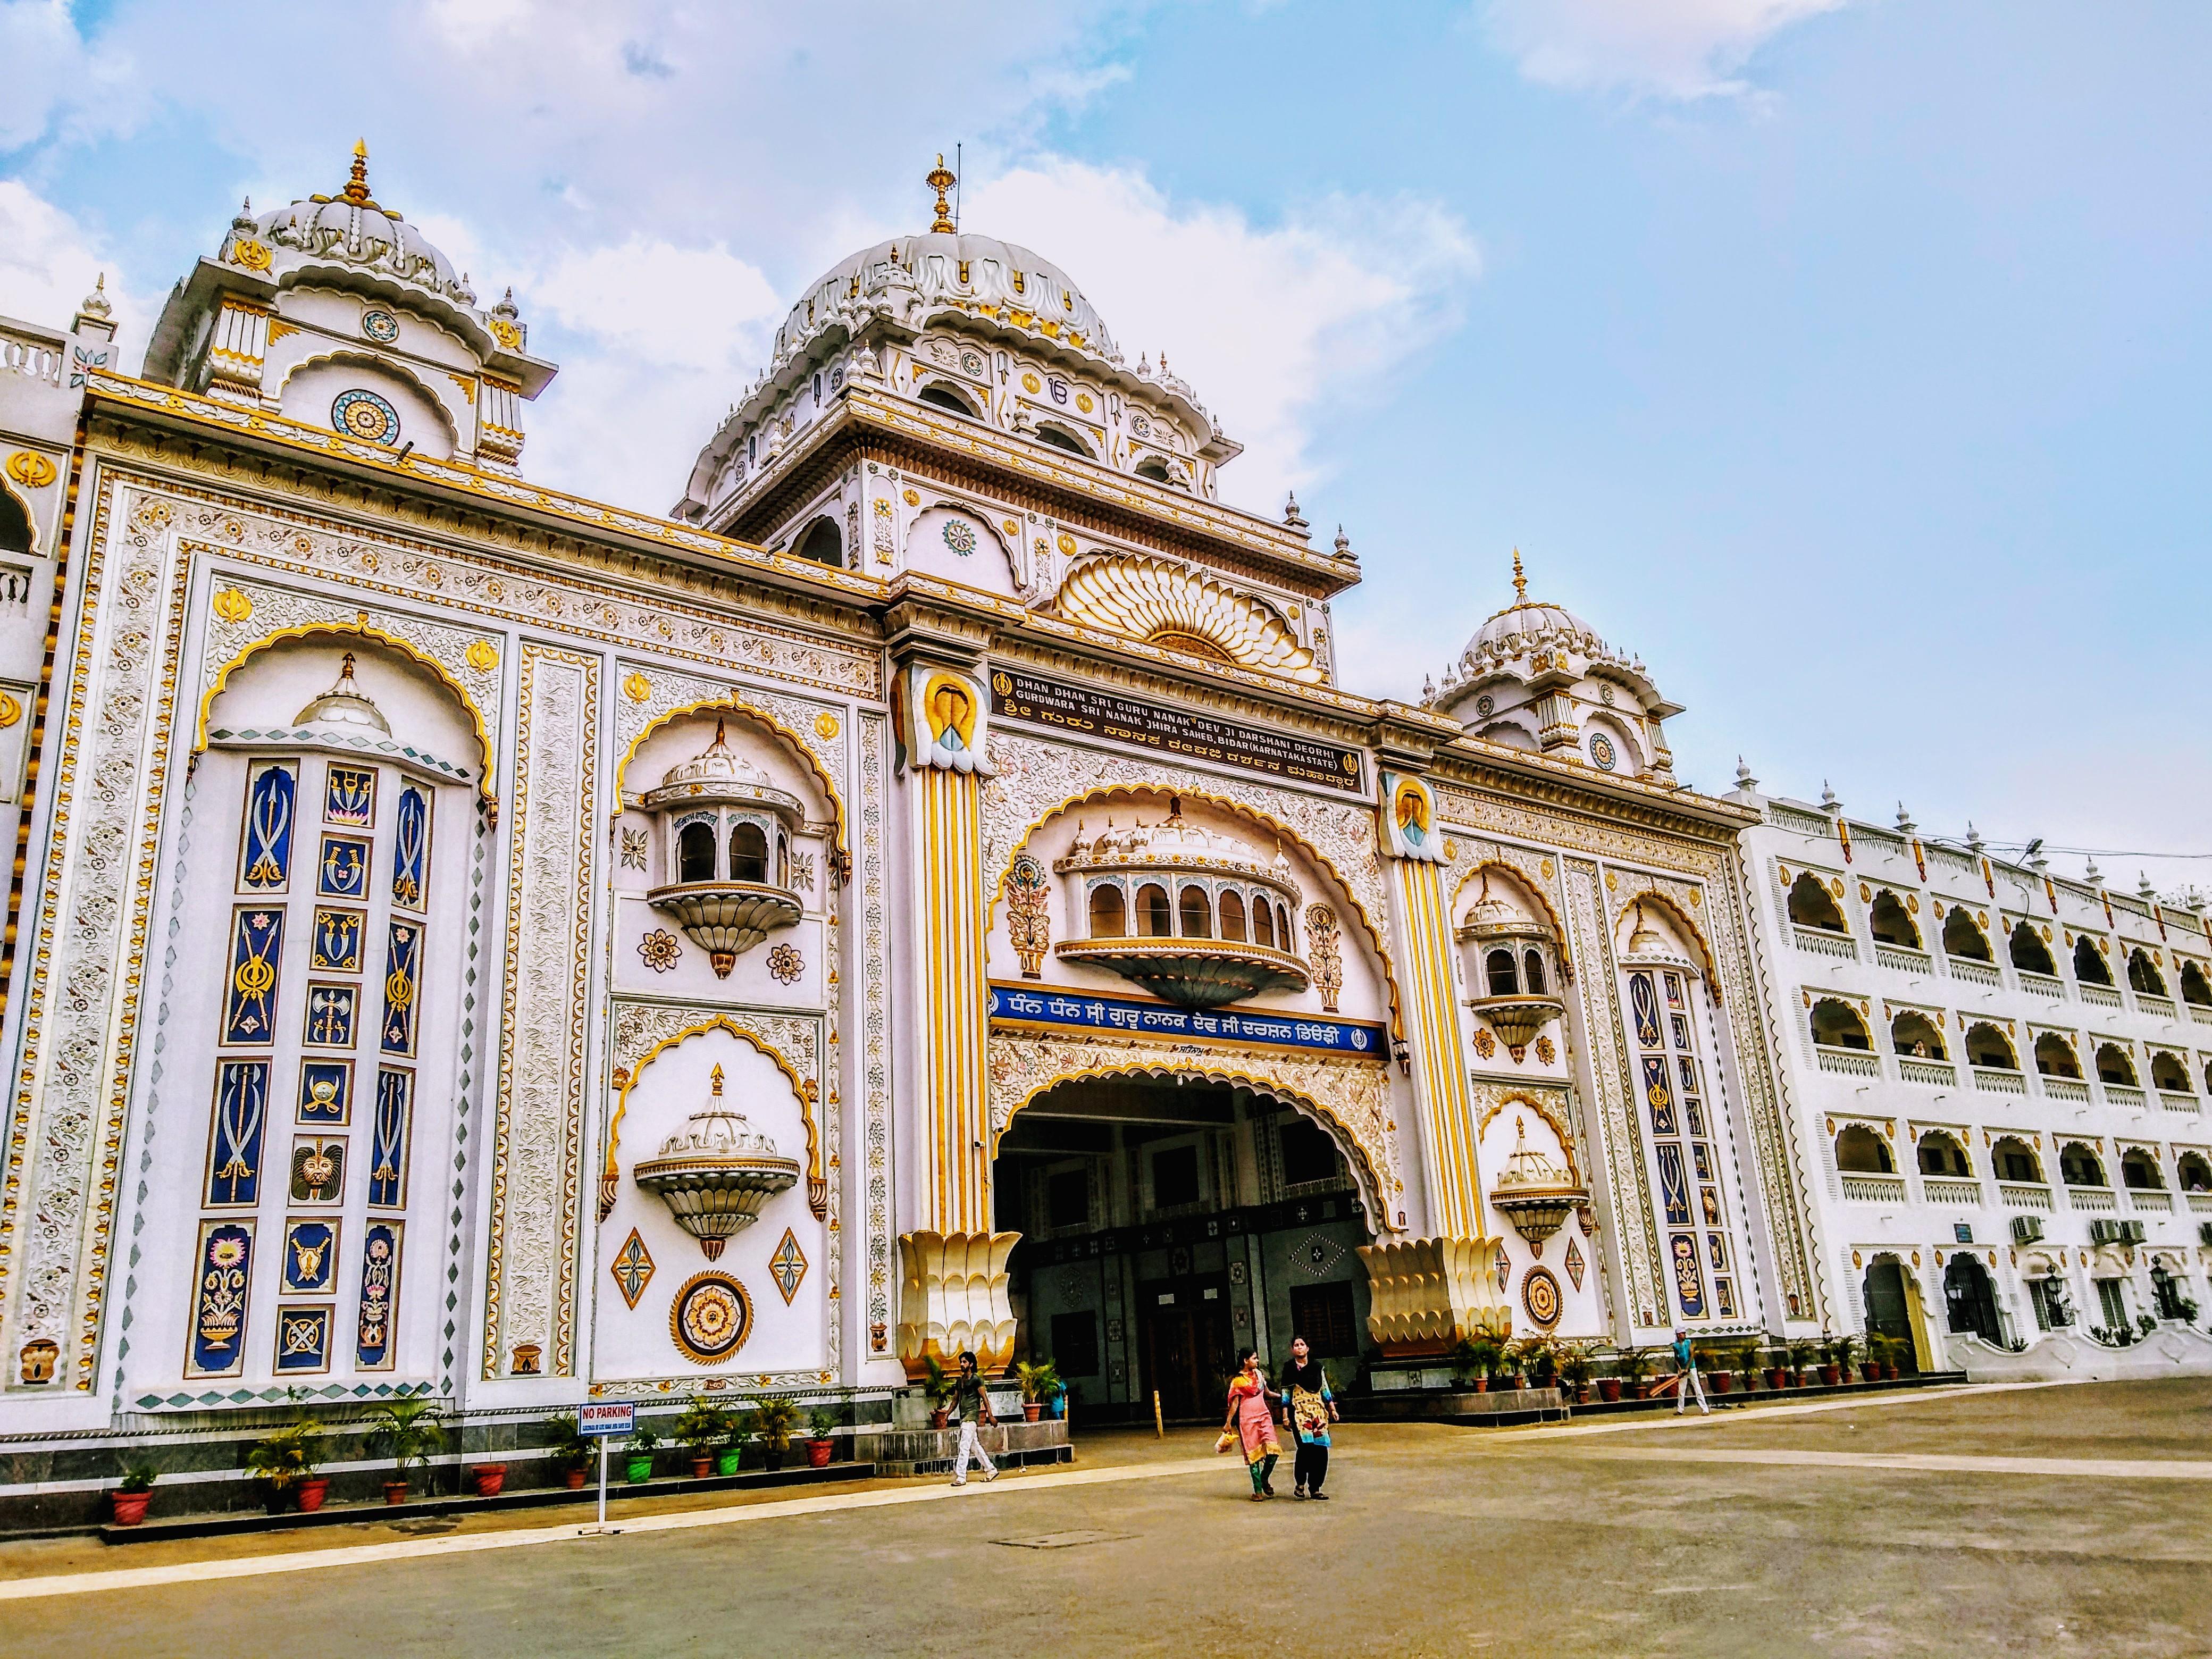 Gurudwara Guru Nanak Jhira Sahib - Bidar, Karnataka.